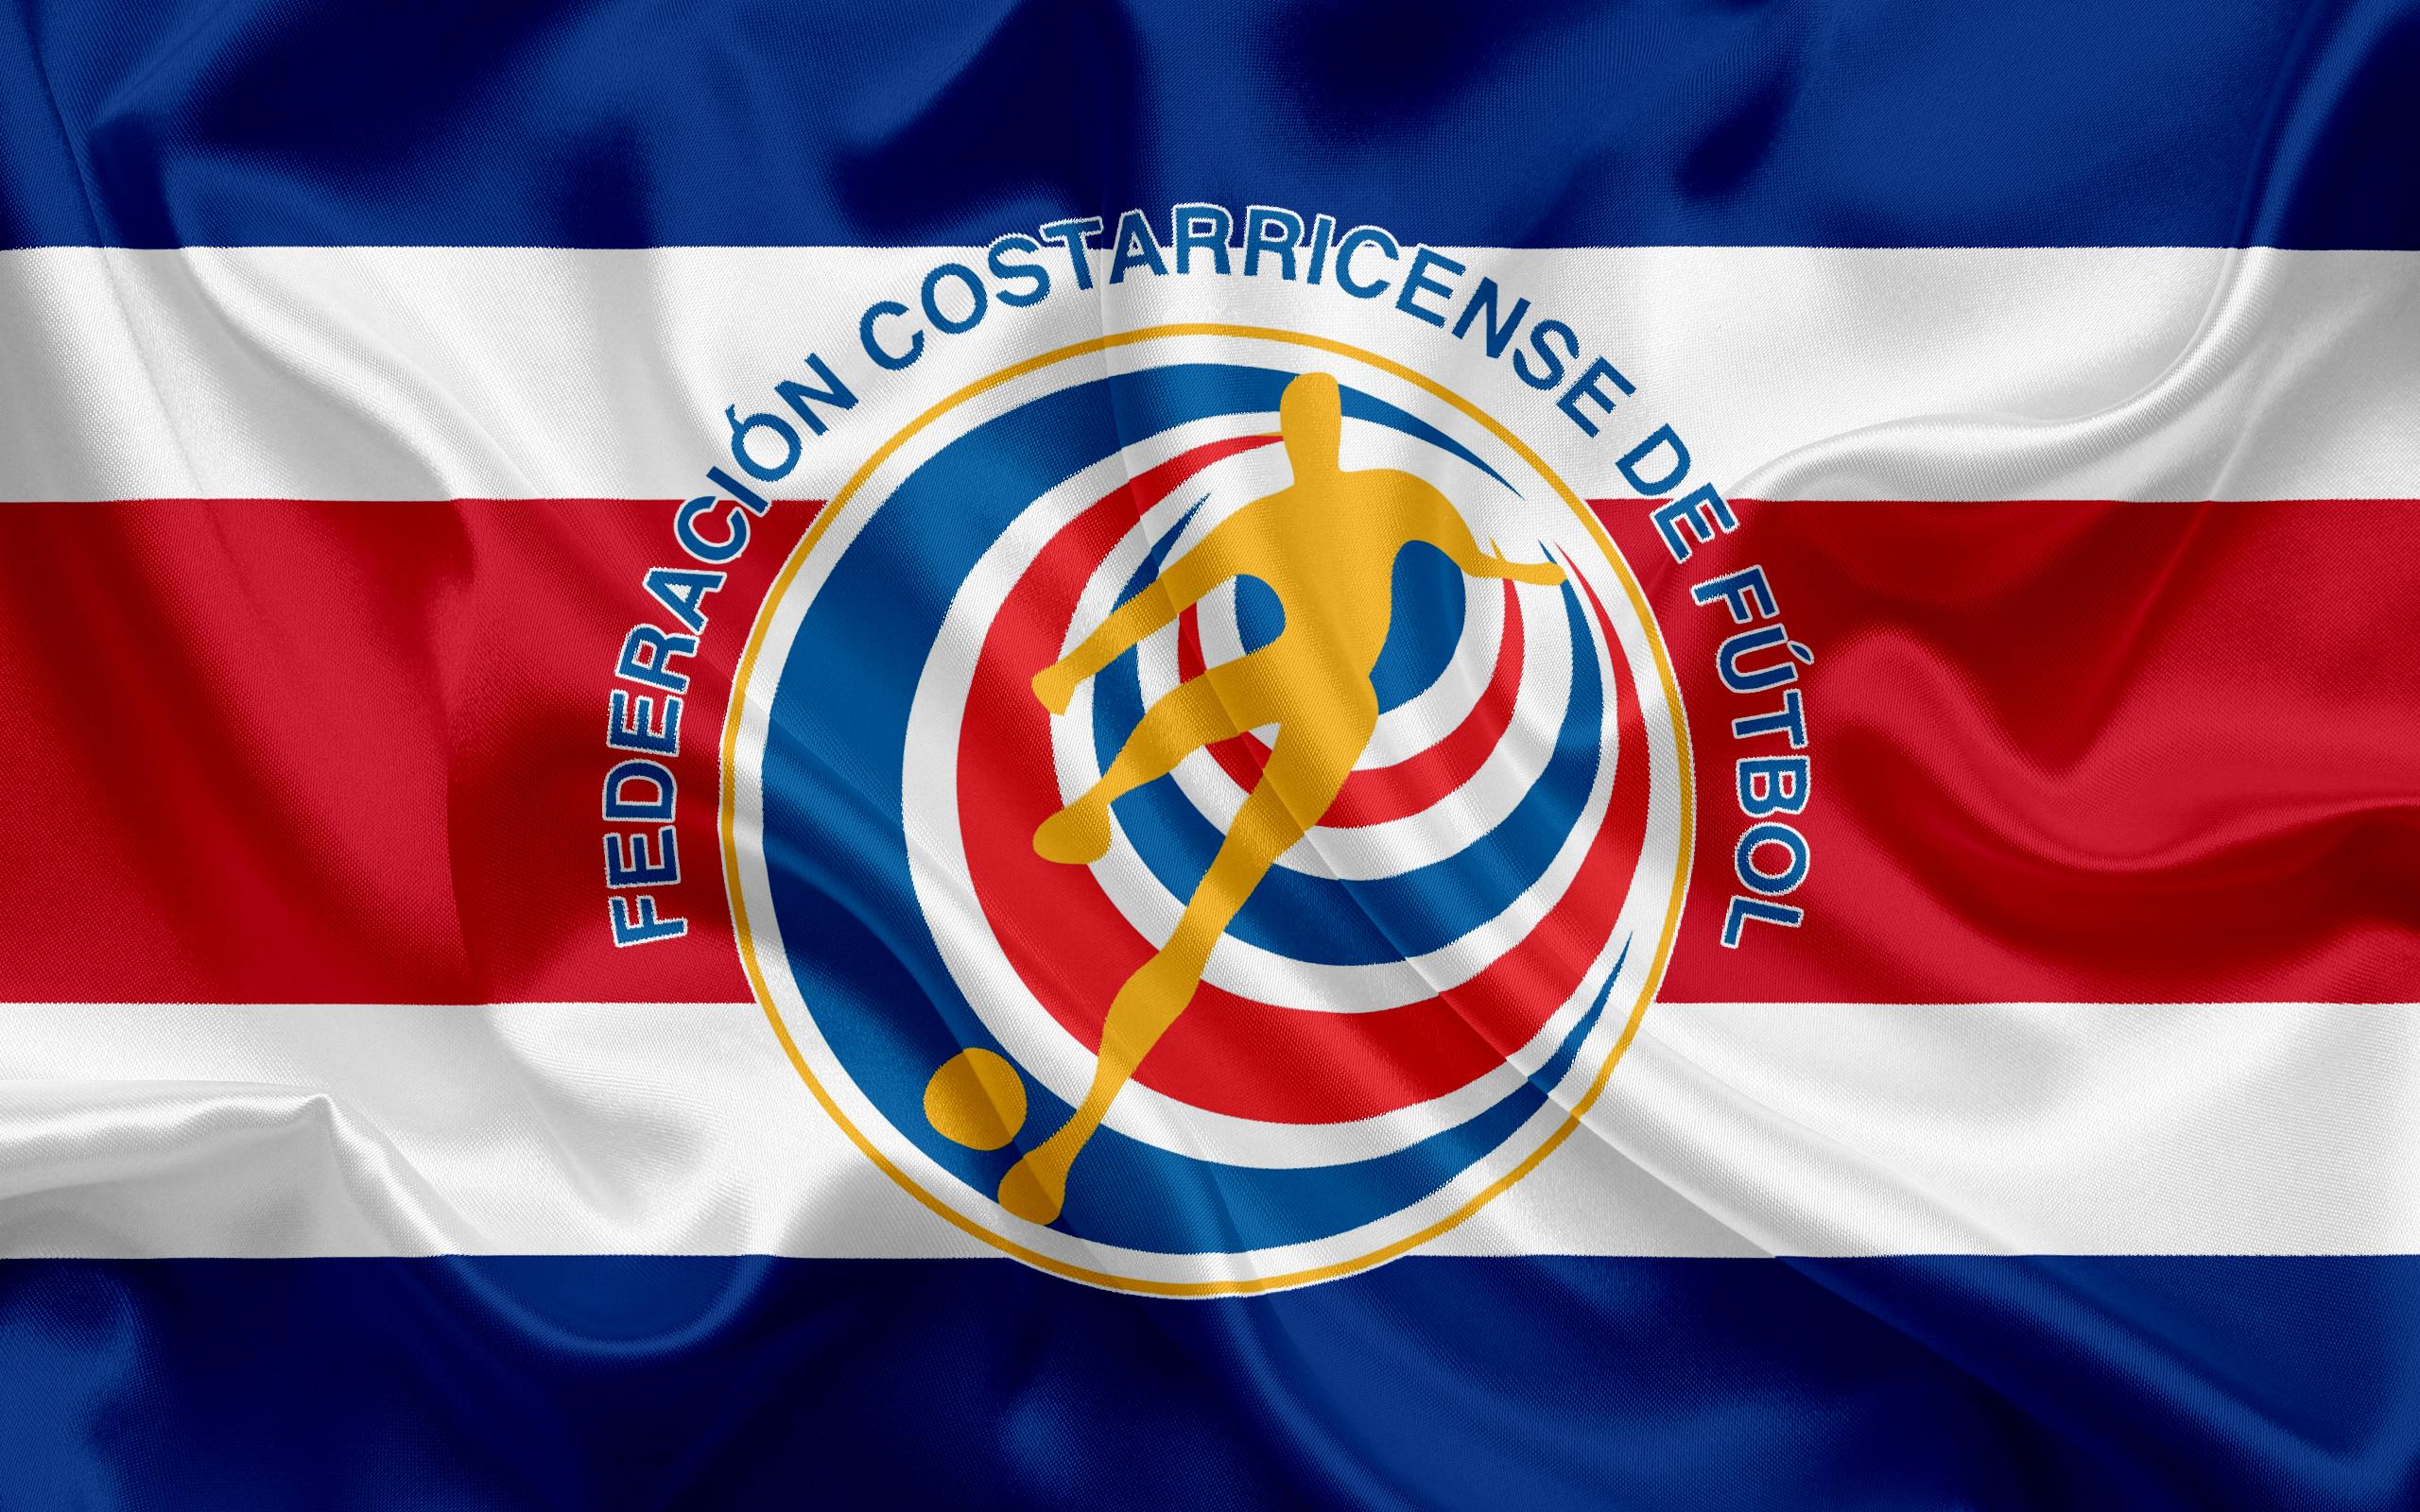 Costa Rica National Football Team Hd Wallpaper Background